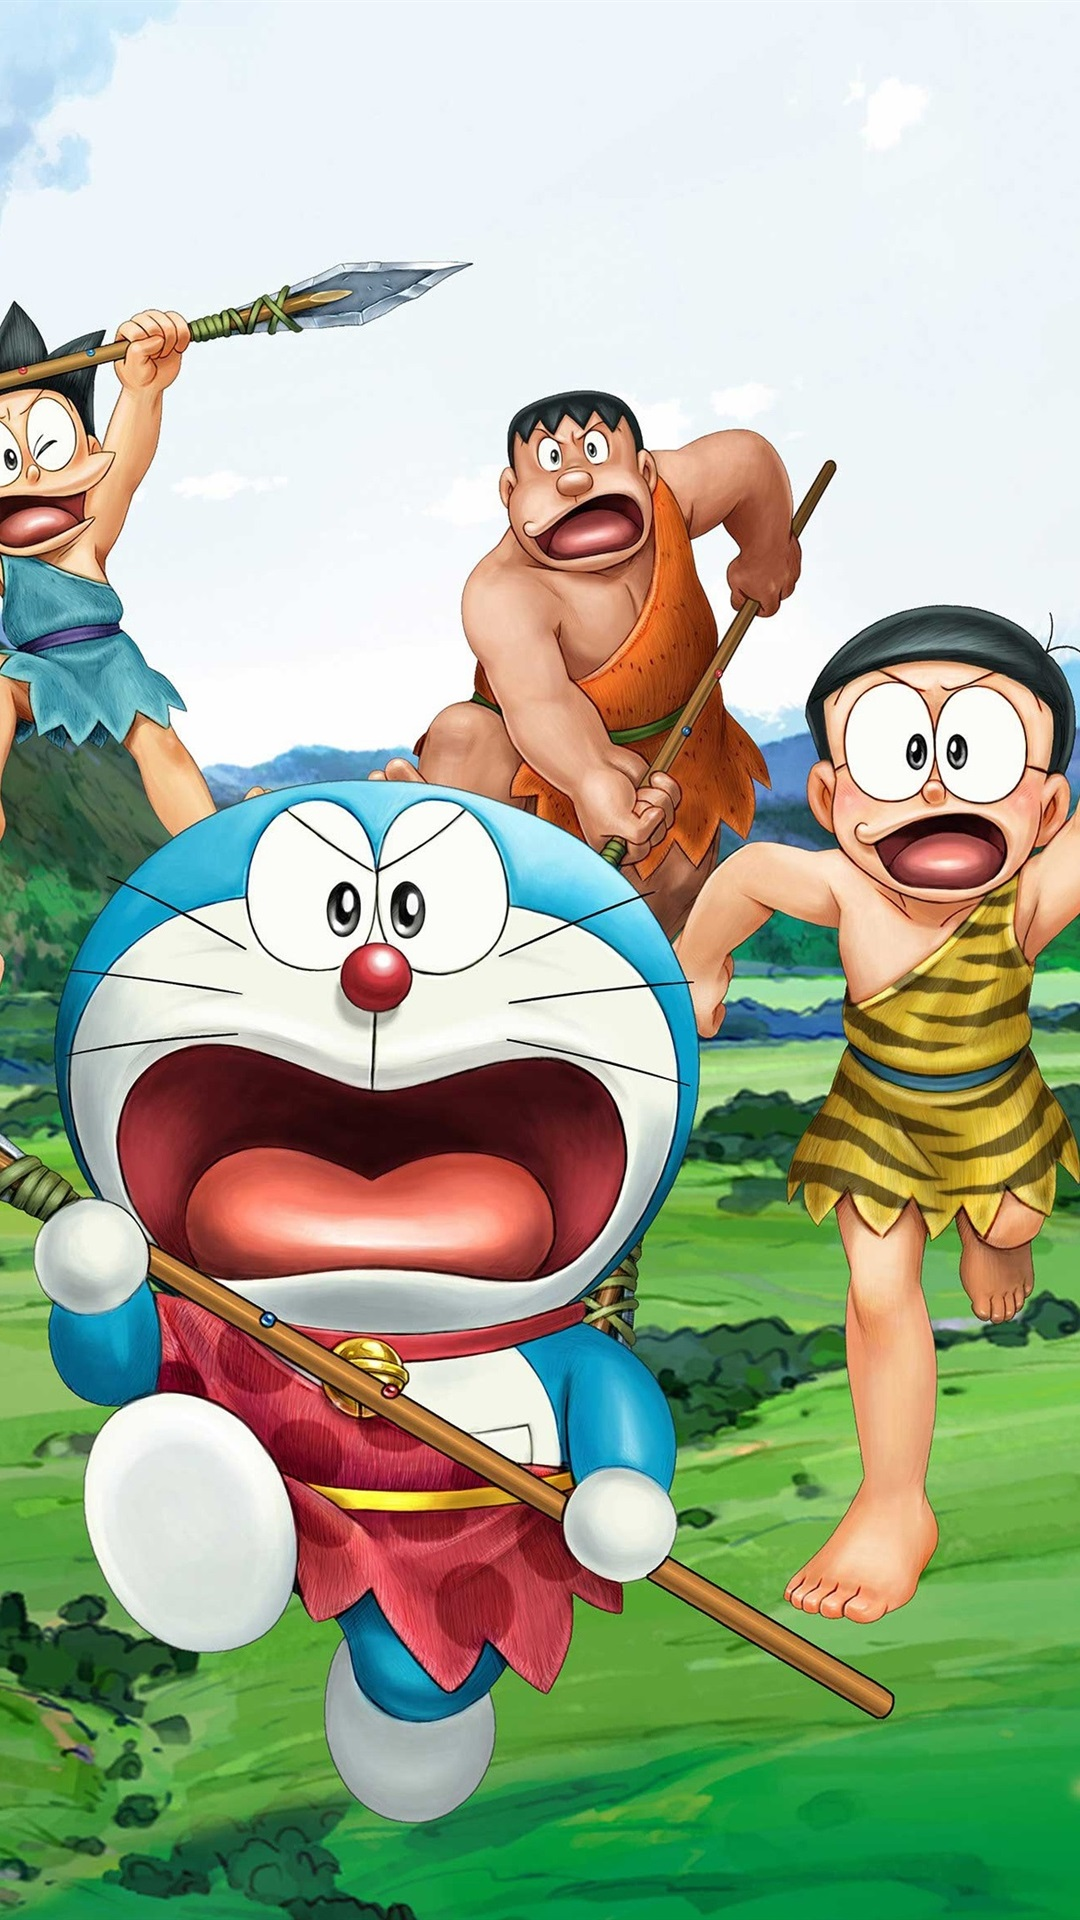 4000 Wallpaper Doraemon Iphone 4  Paling Keren